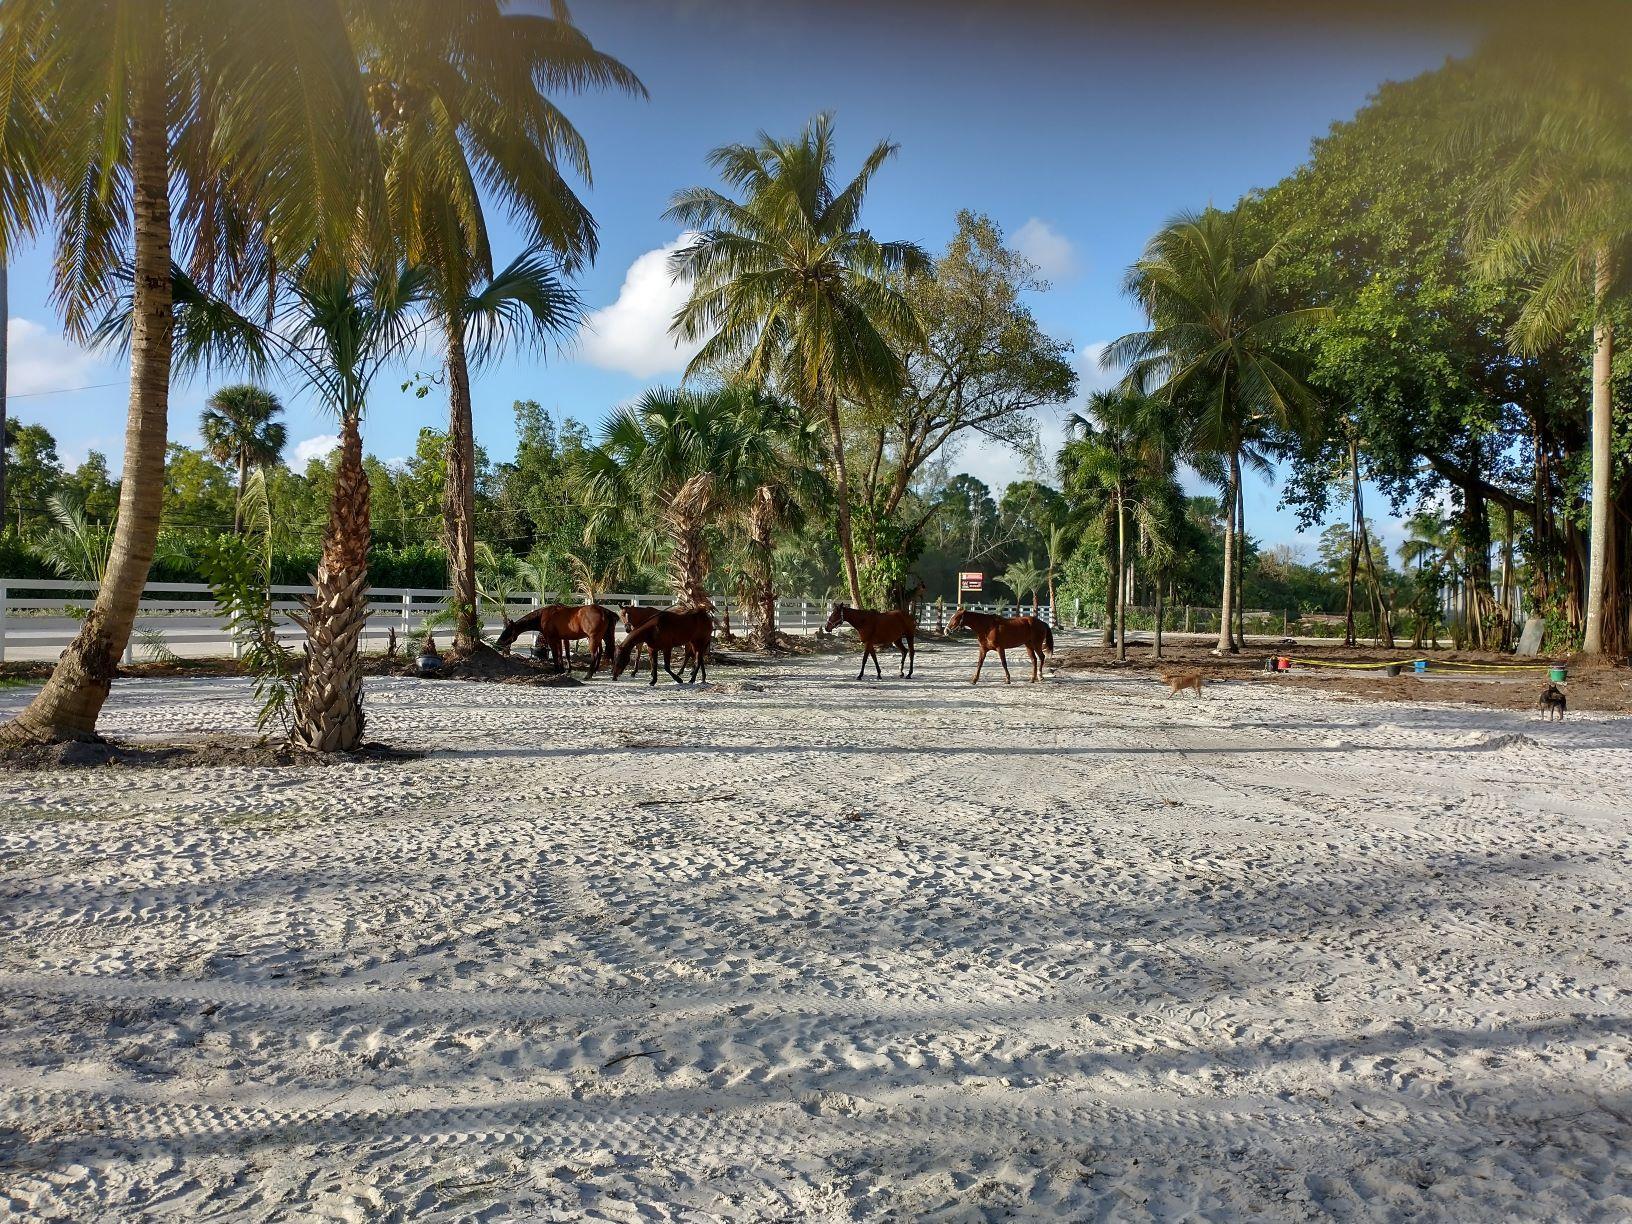 1100 horses for Ag Classification MEDIUM